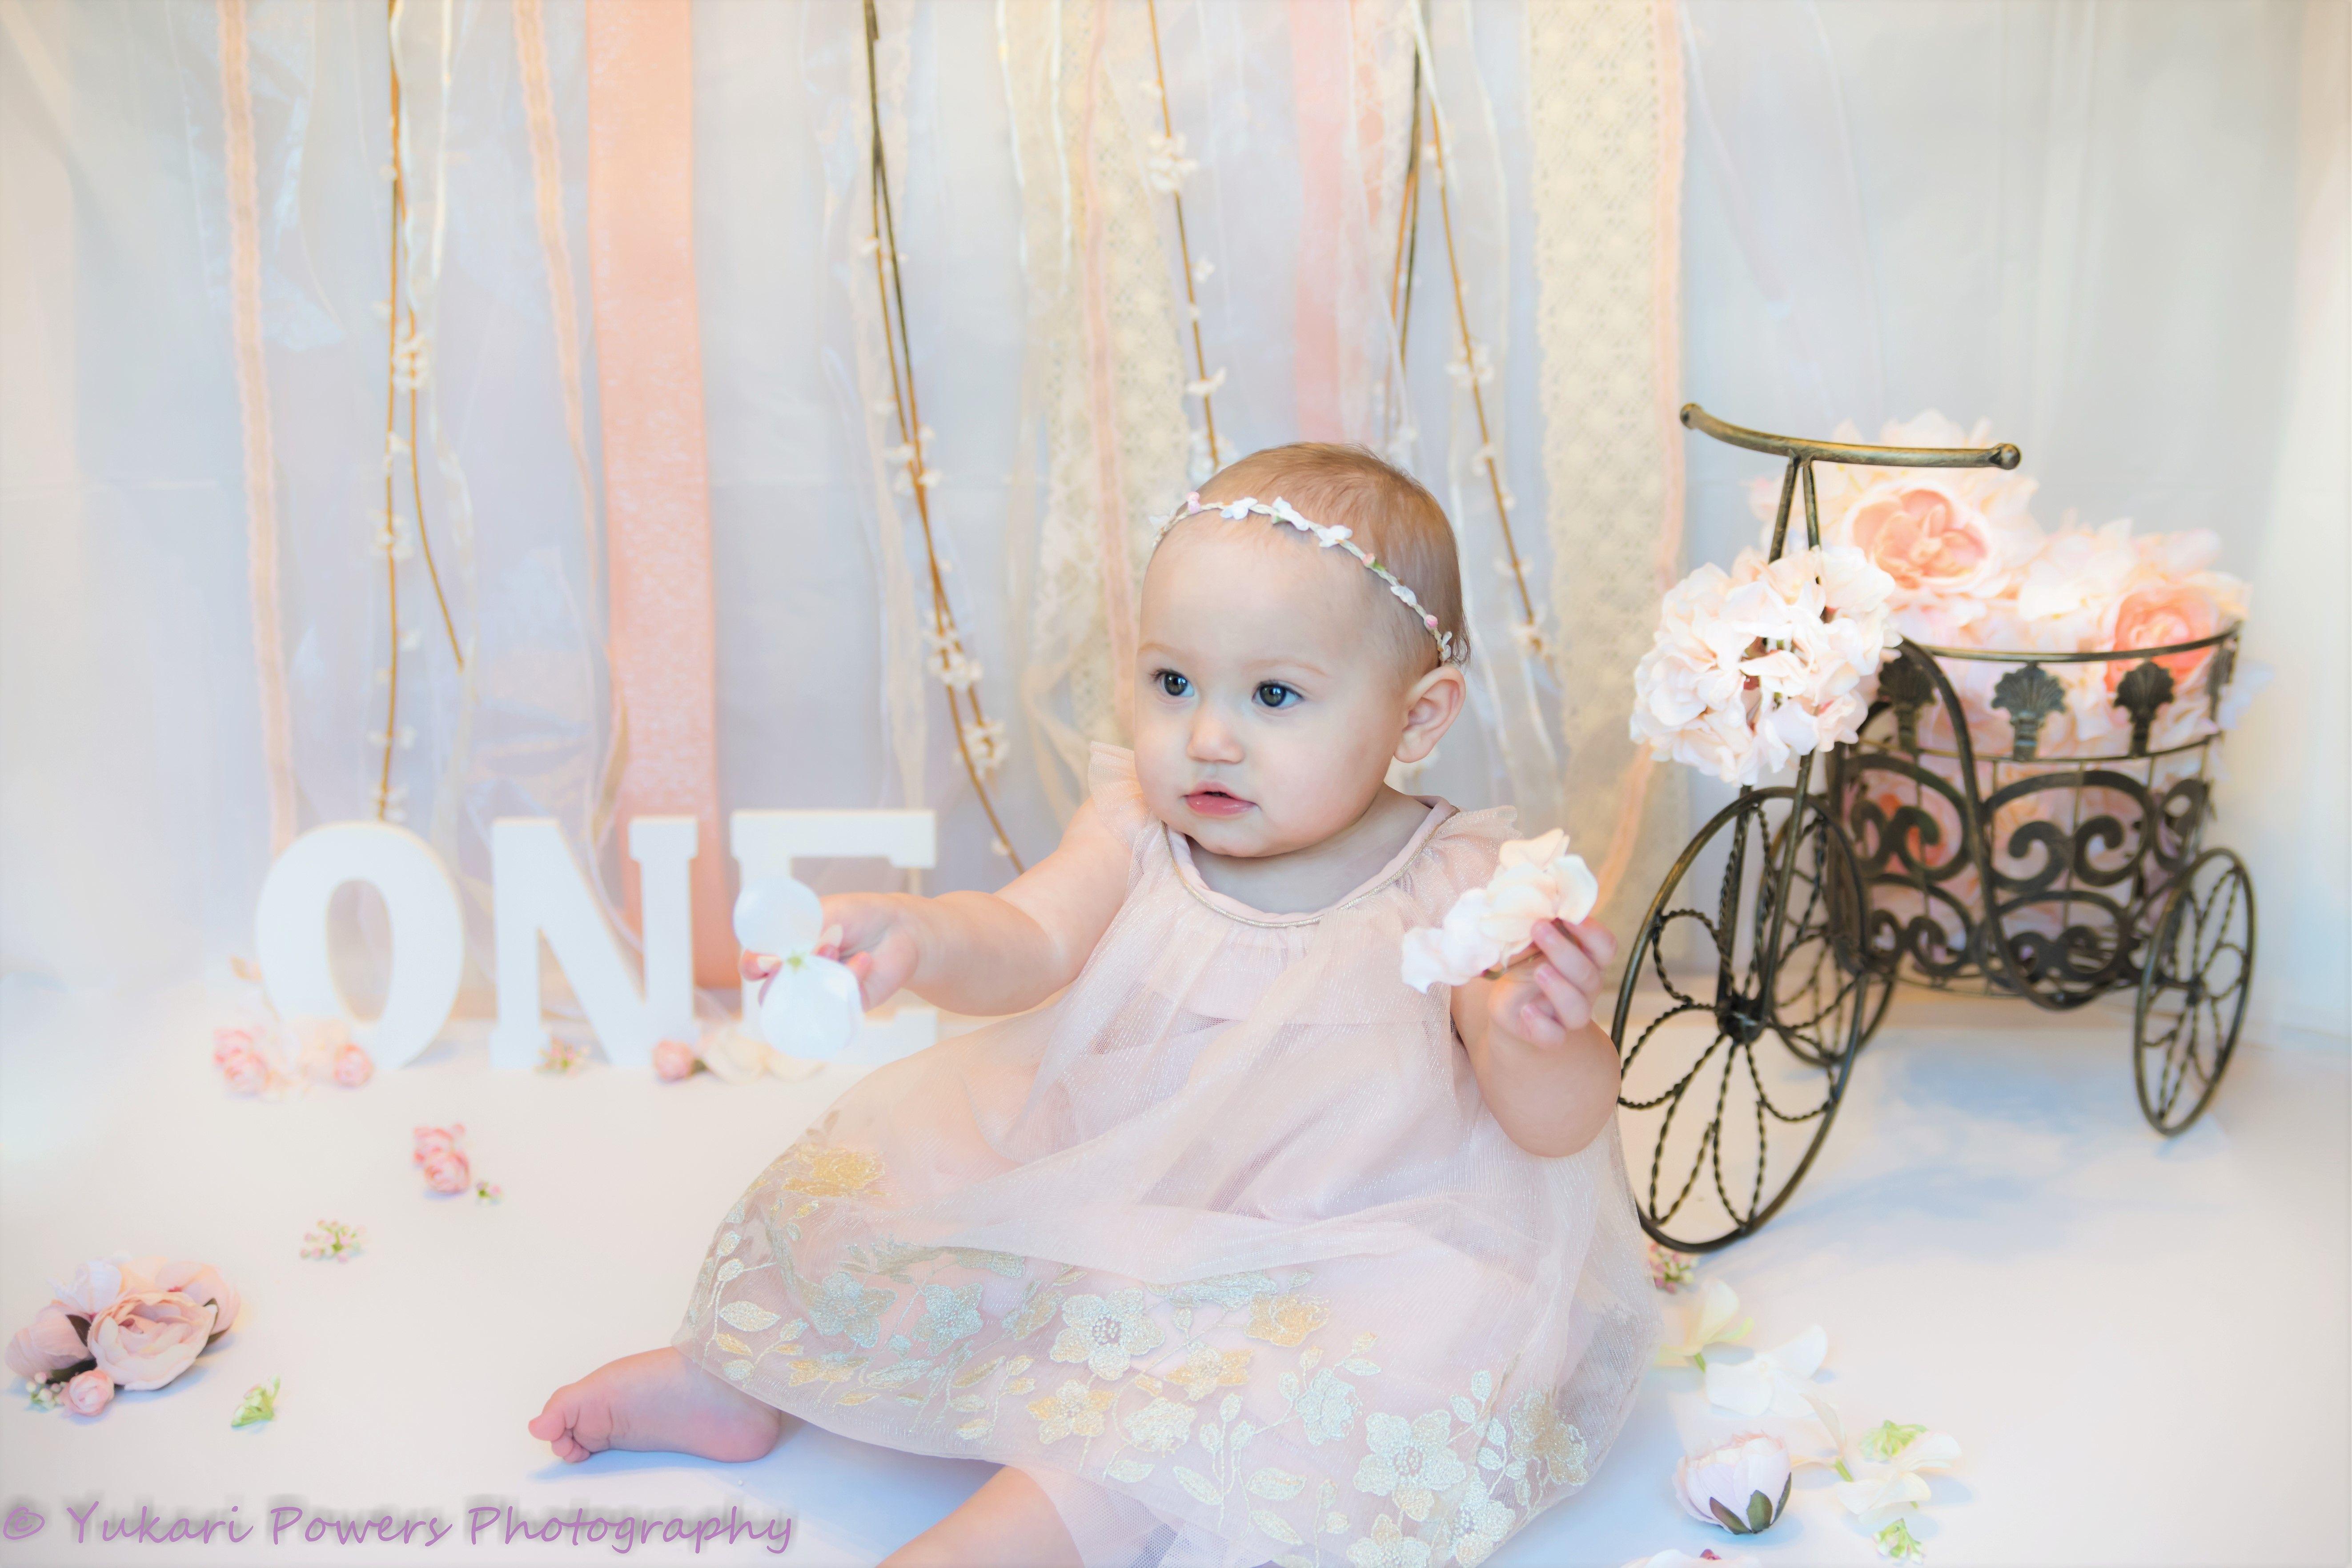 Cake Smash Photography Taken By Yukari Powers In Vancouver Washington Baby Girls First Birthday